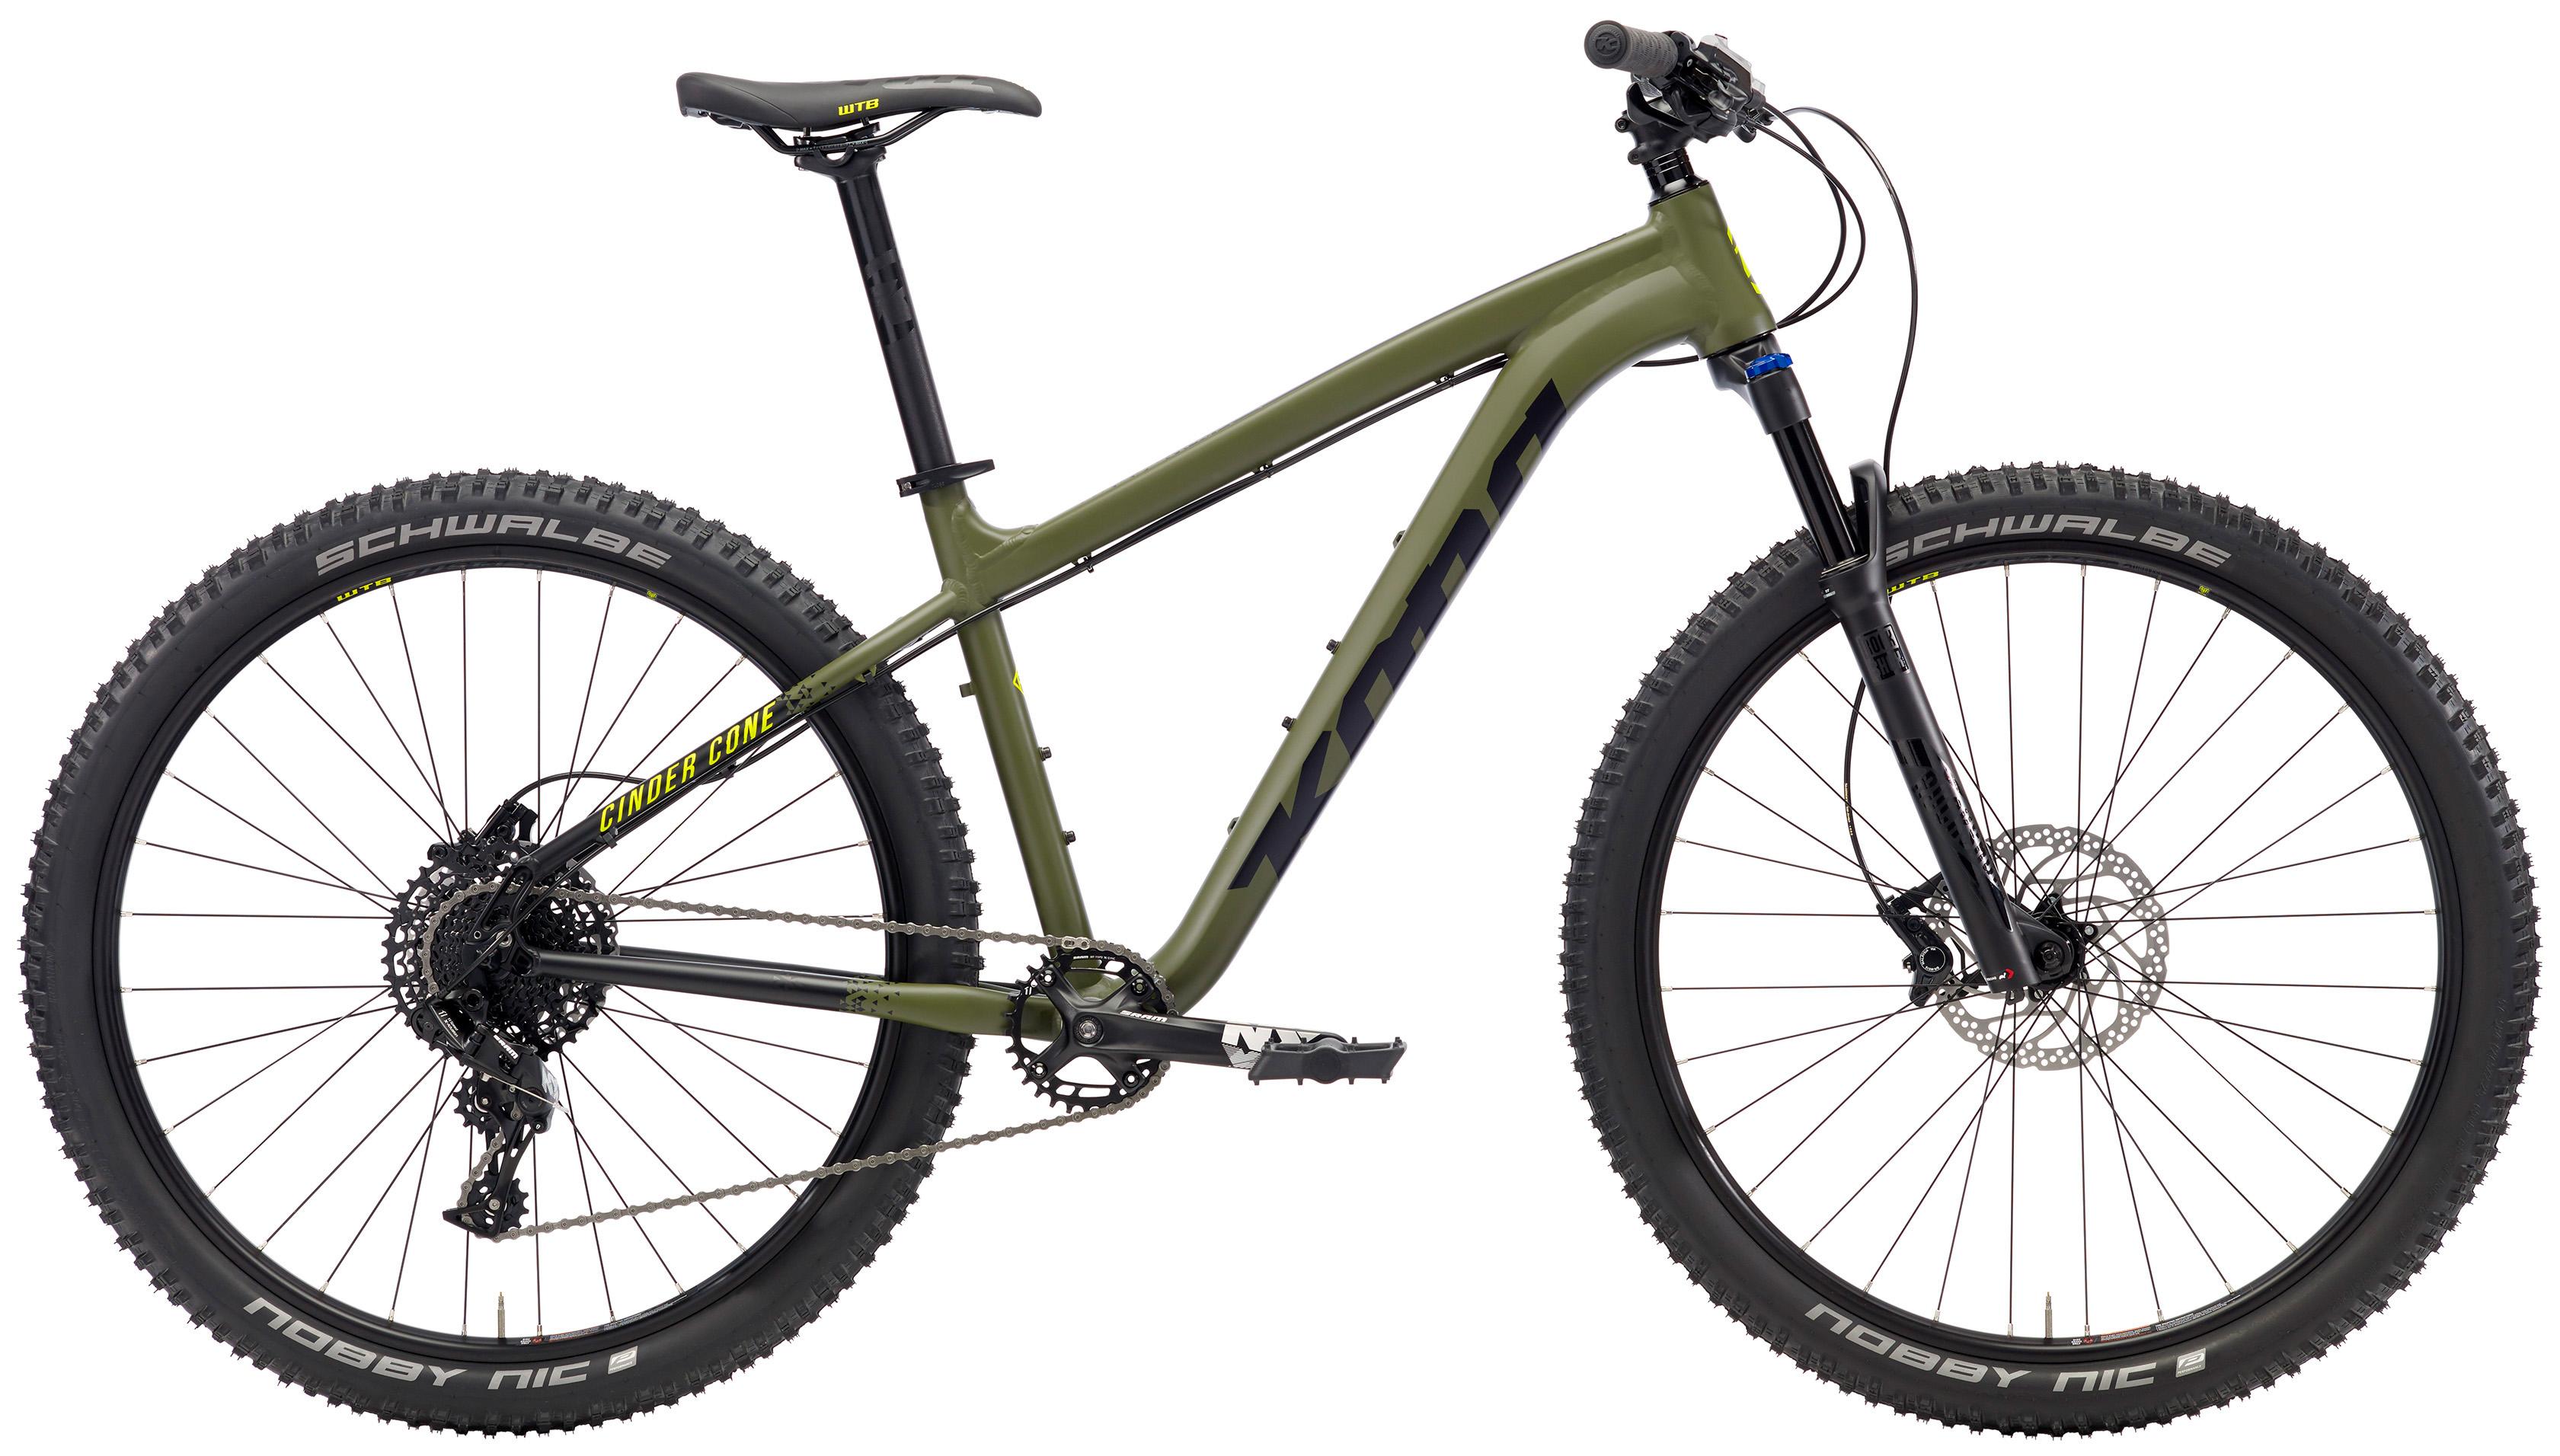 cinder cone - Mountain Bike Frame